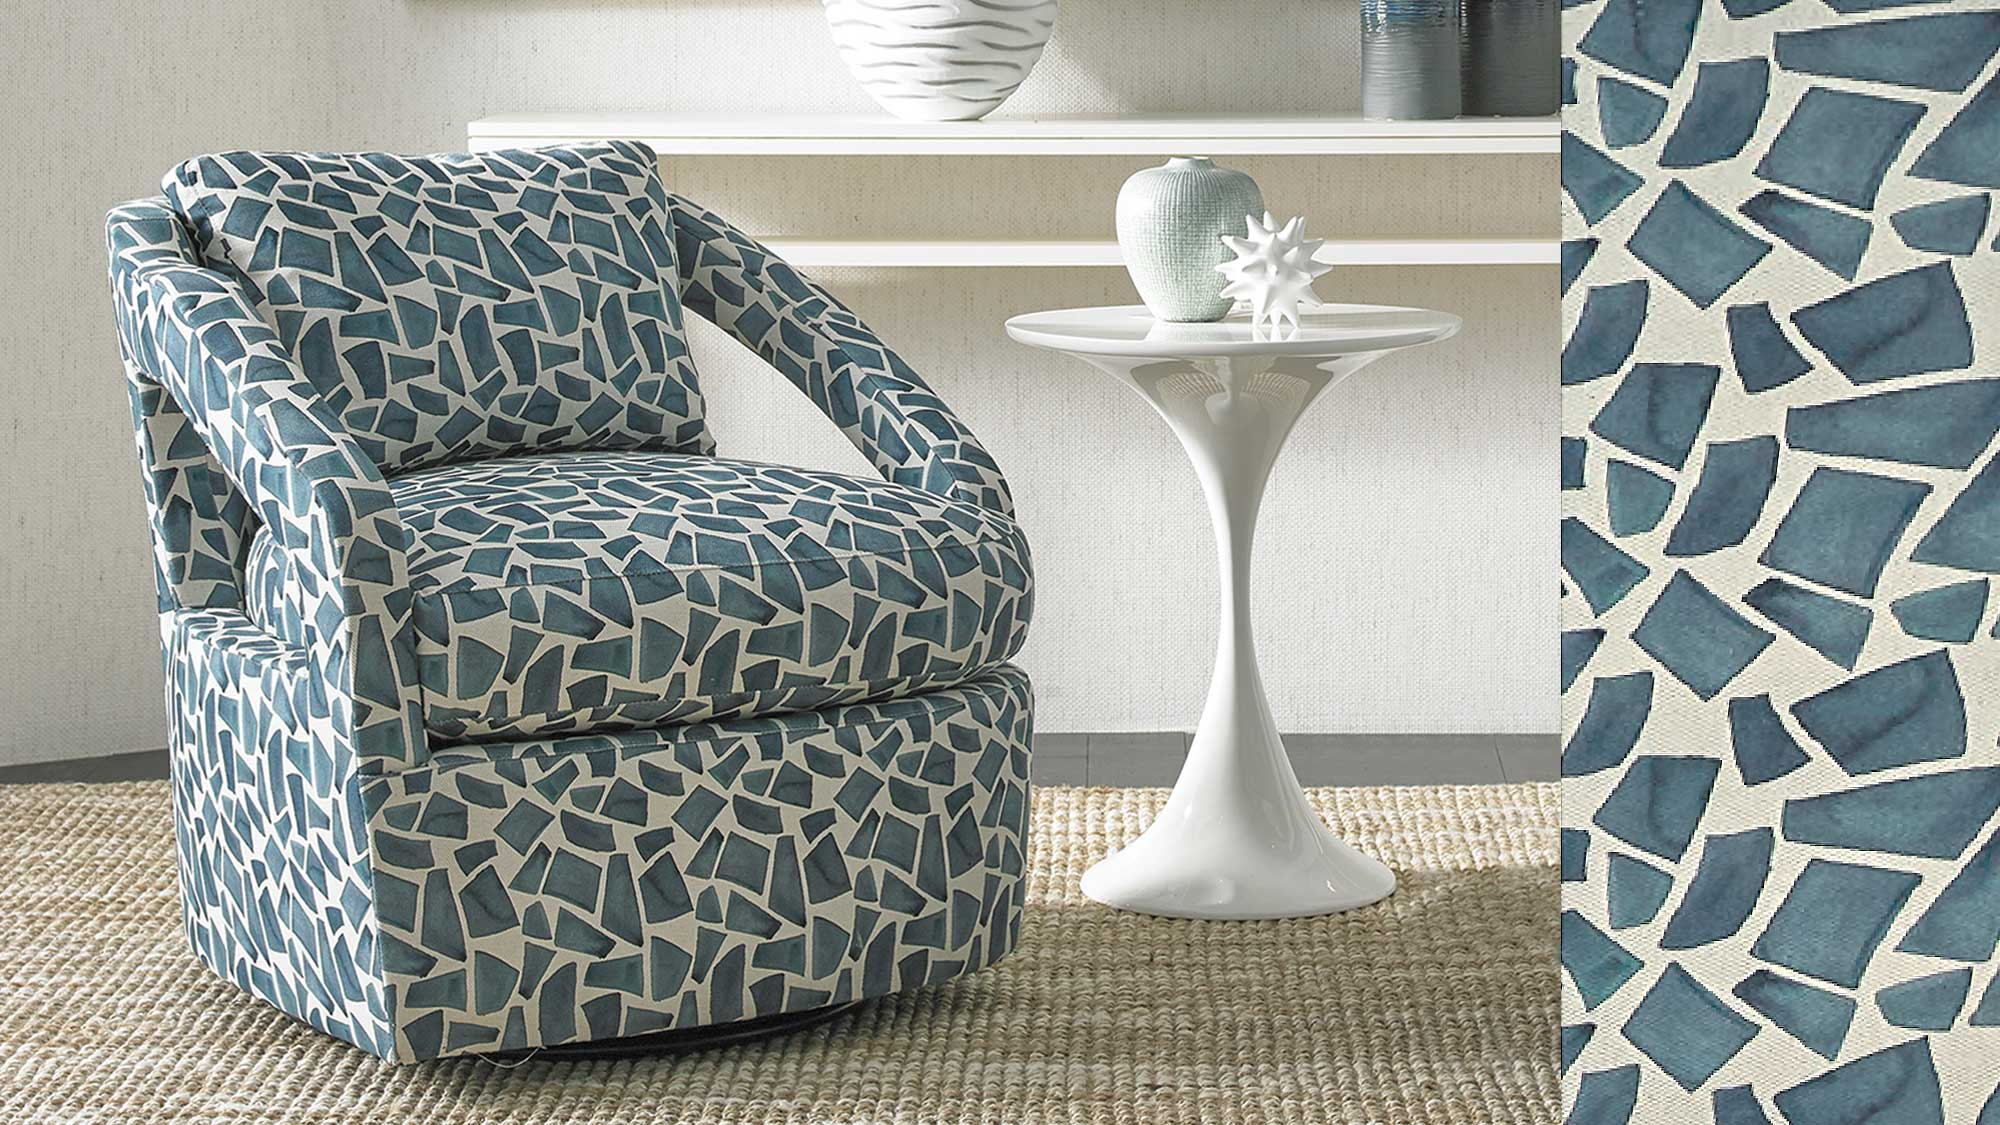 sherrill furniture company made